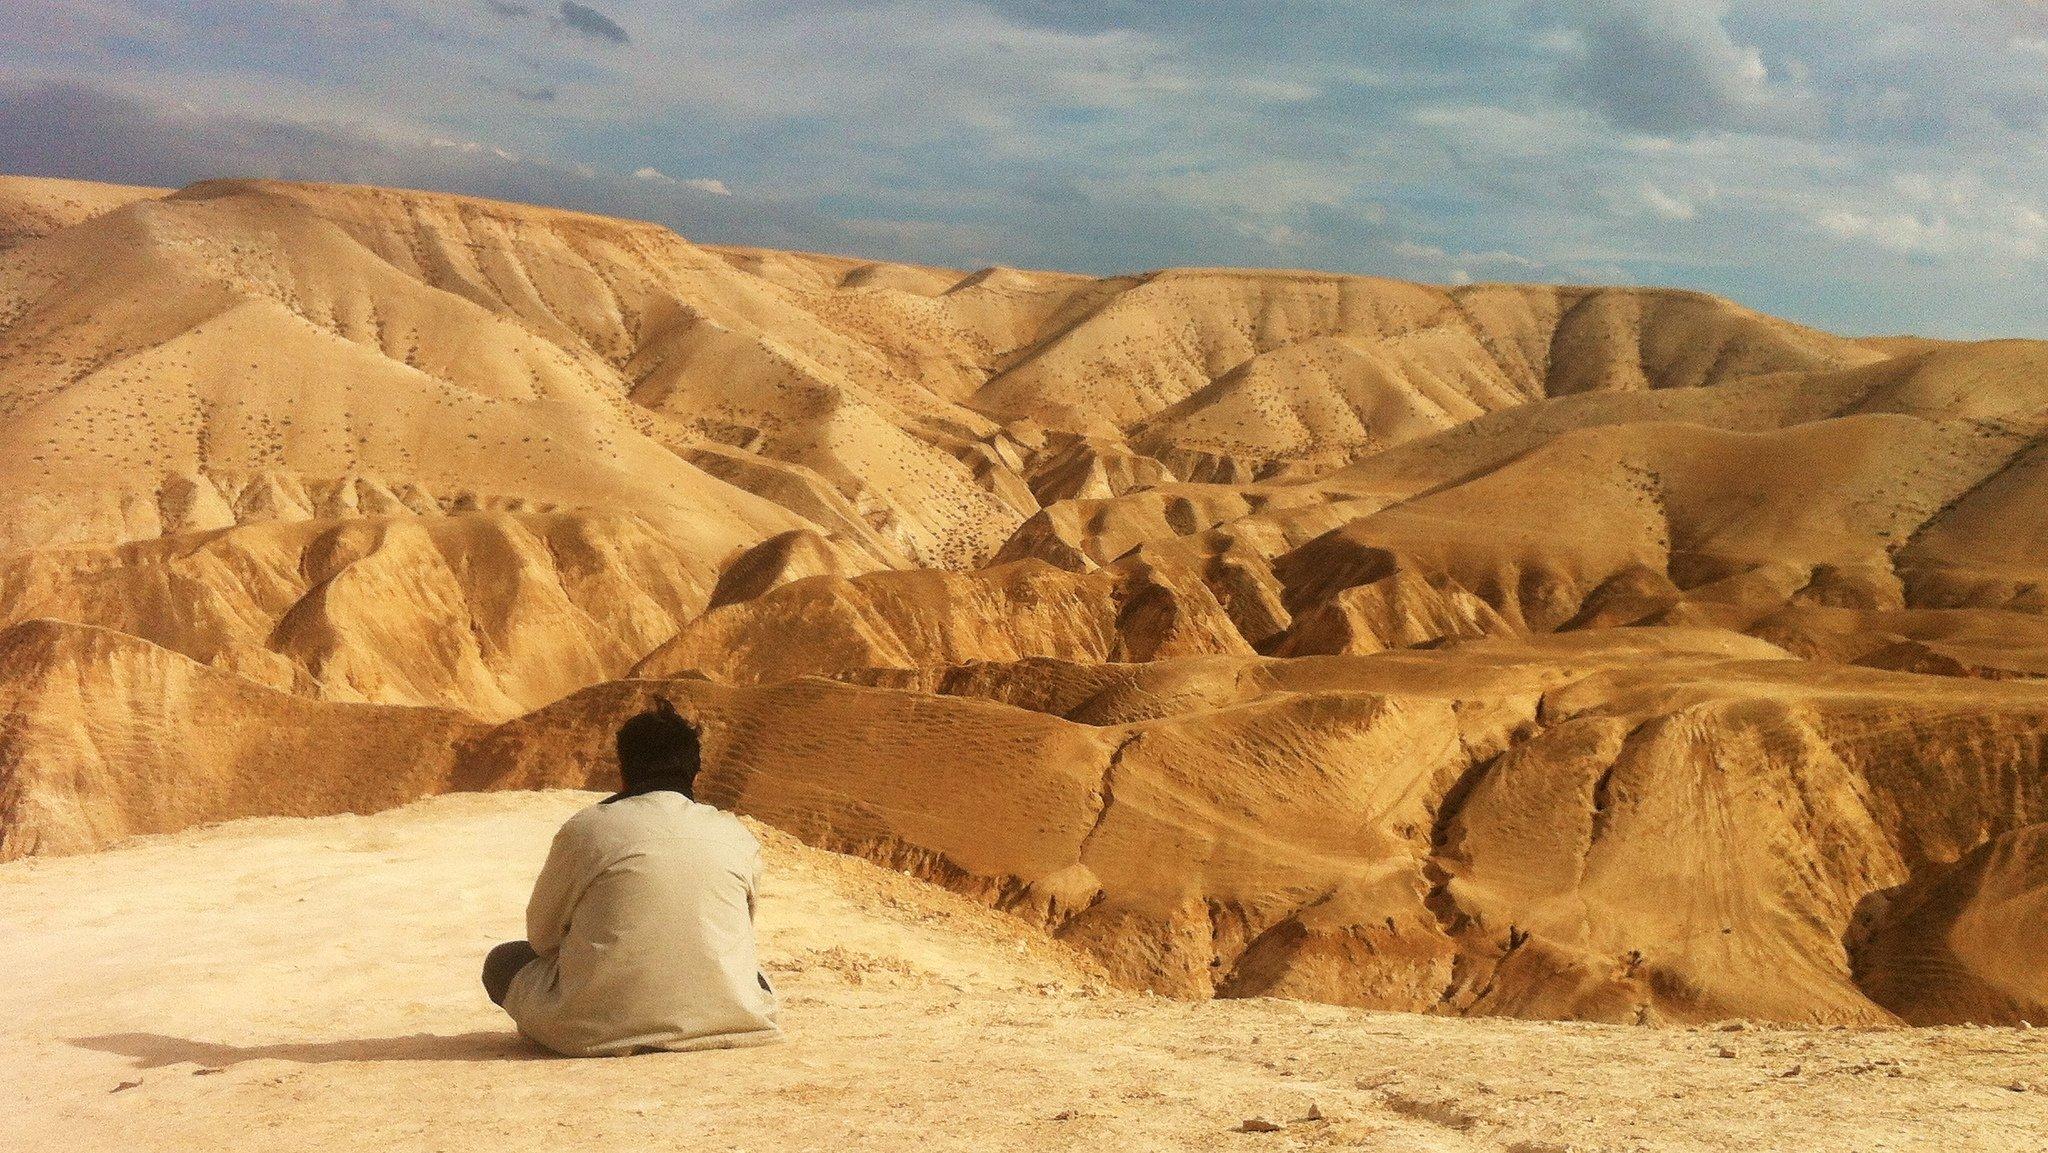 Desierto barrera